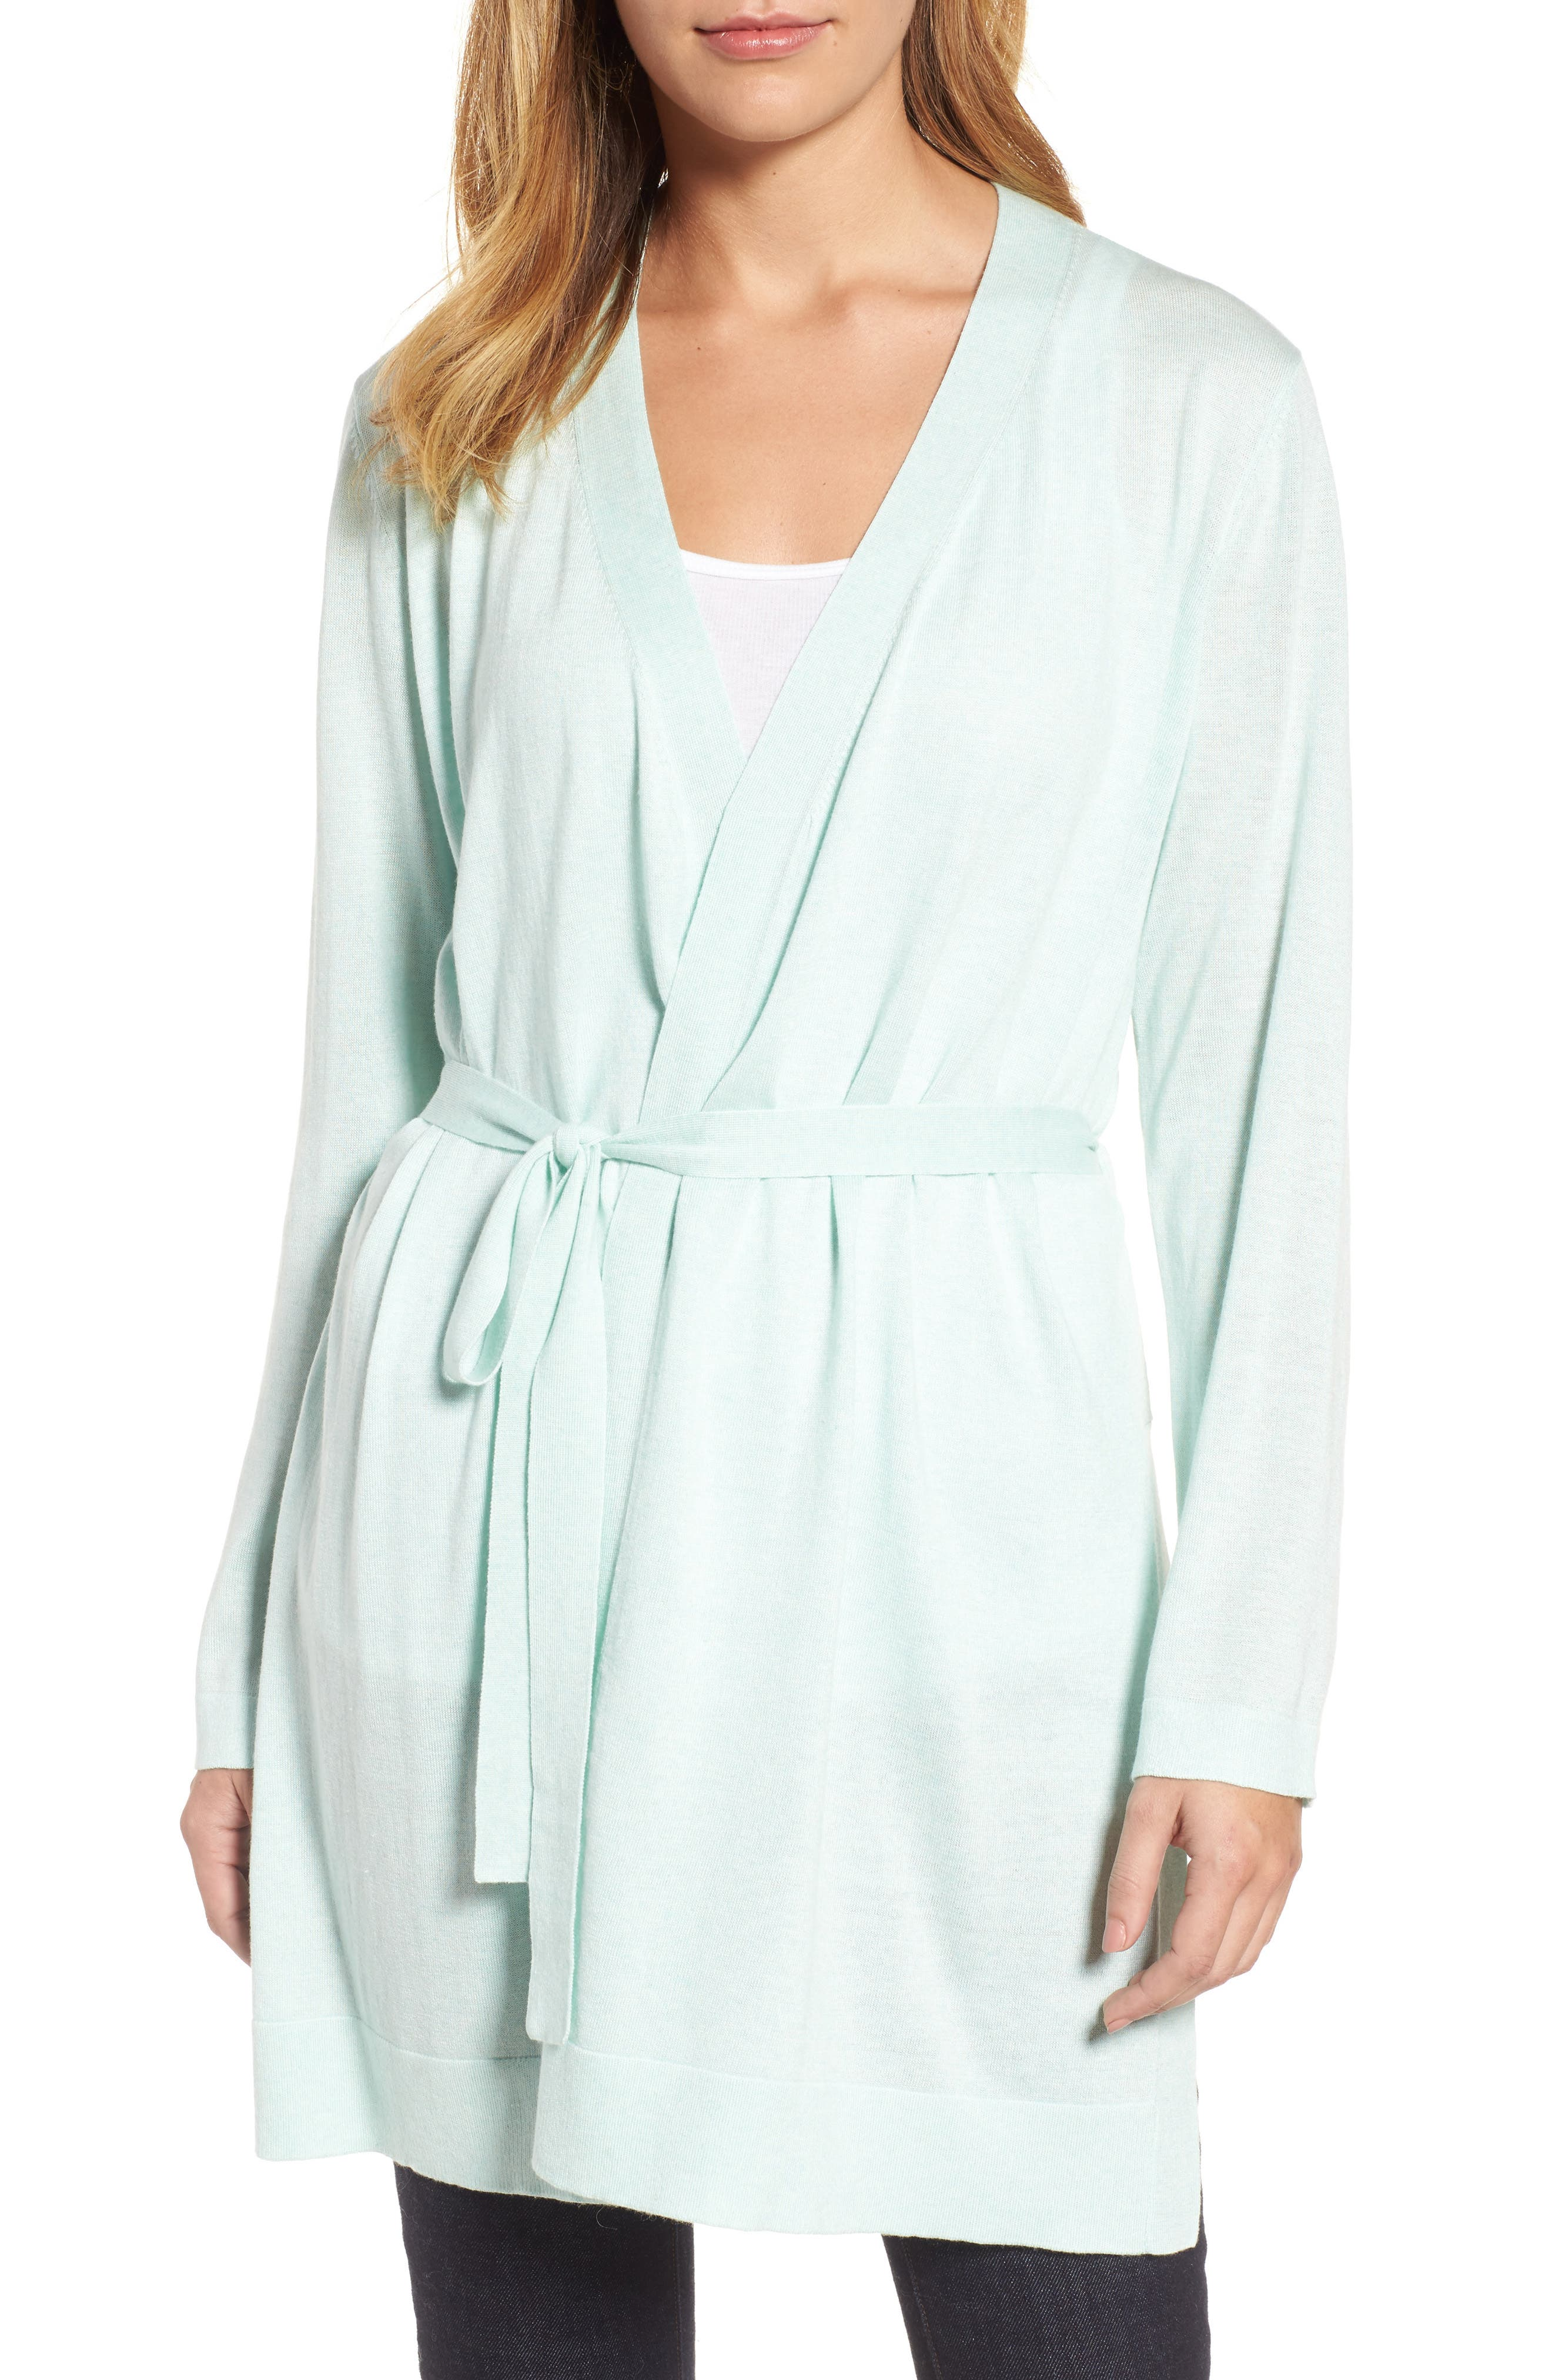 Main Image - Eileen Fisher Tie Waist Tencel® Lyocell Blend Cardigan (Regular & Petite)